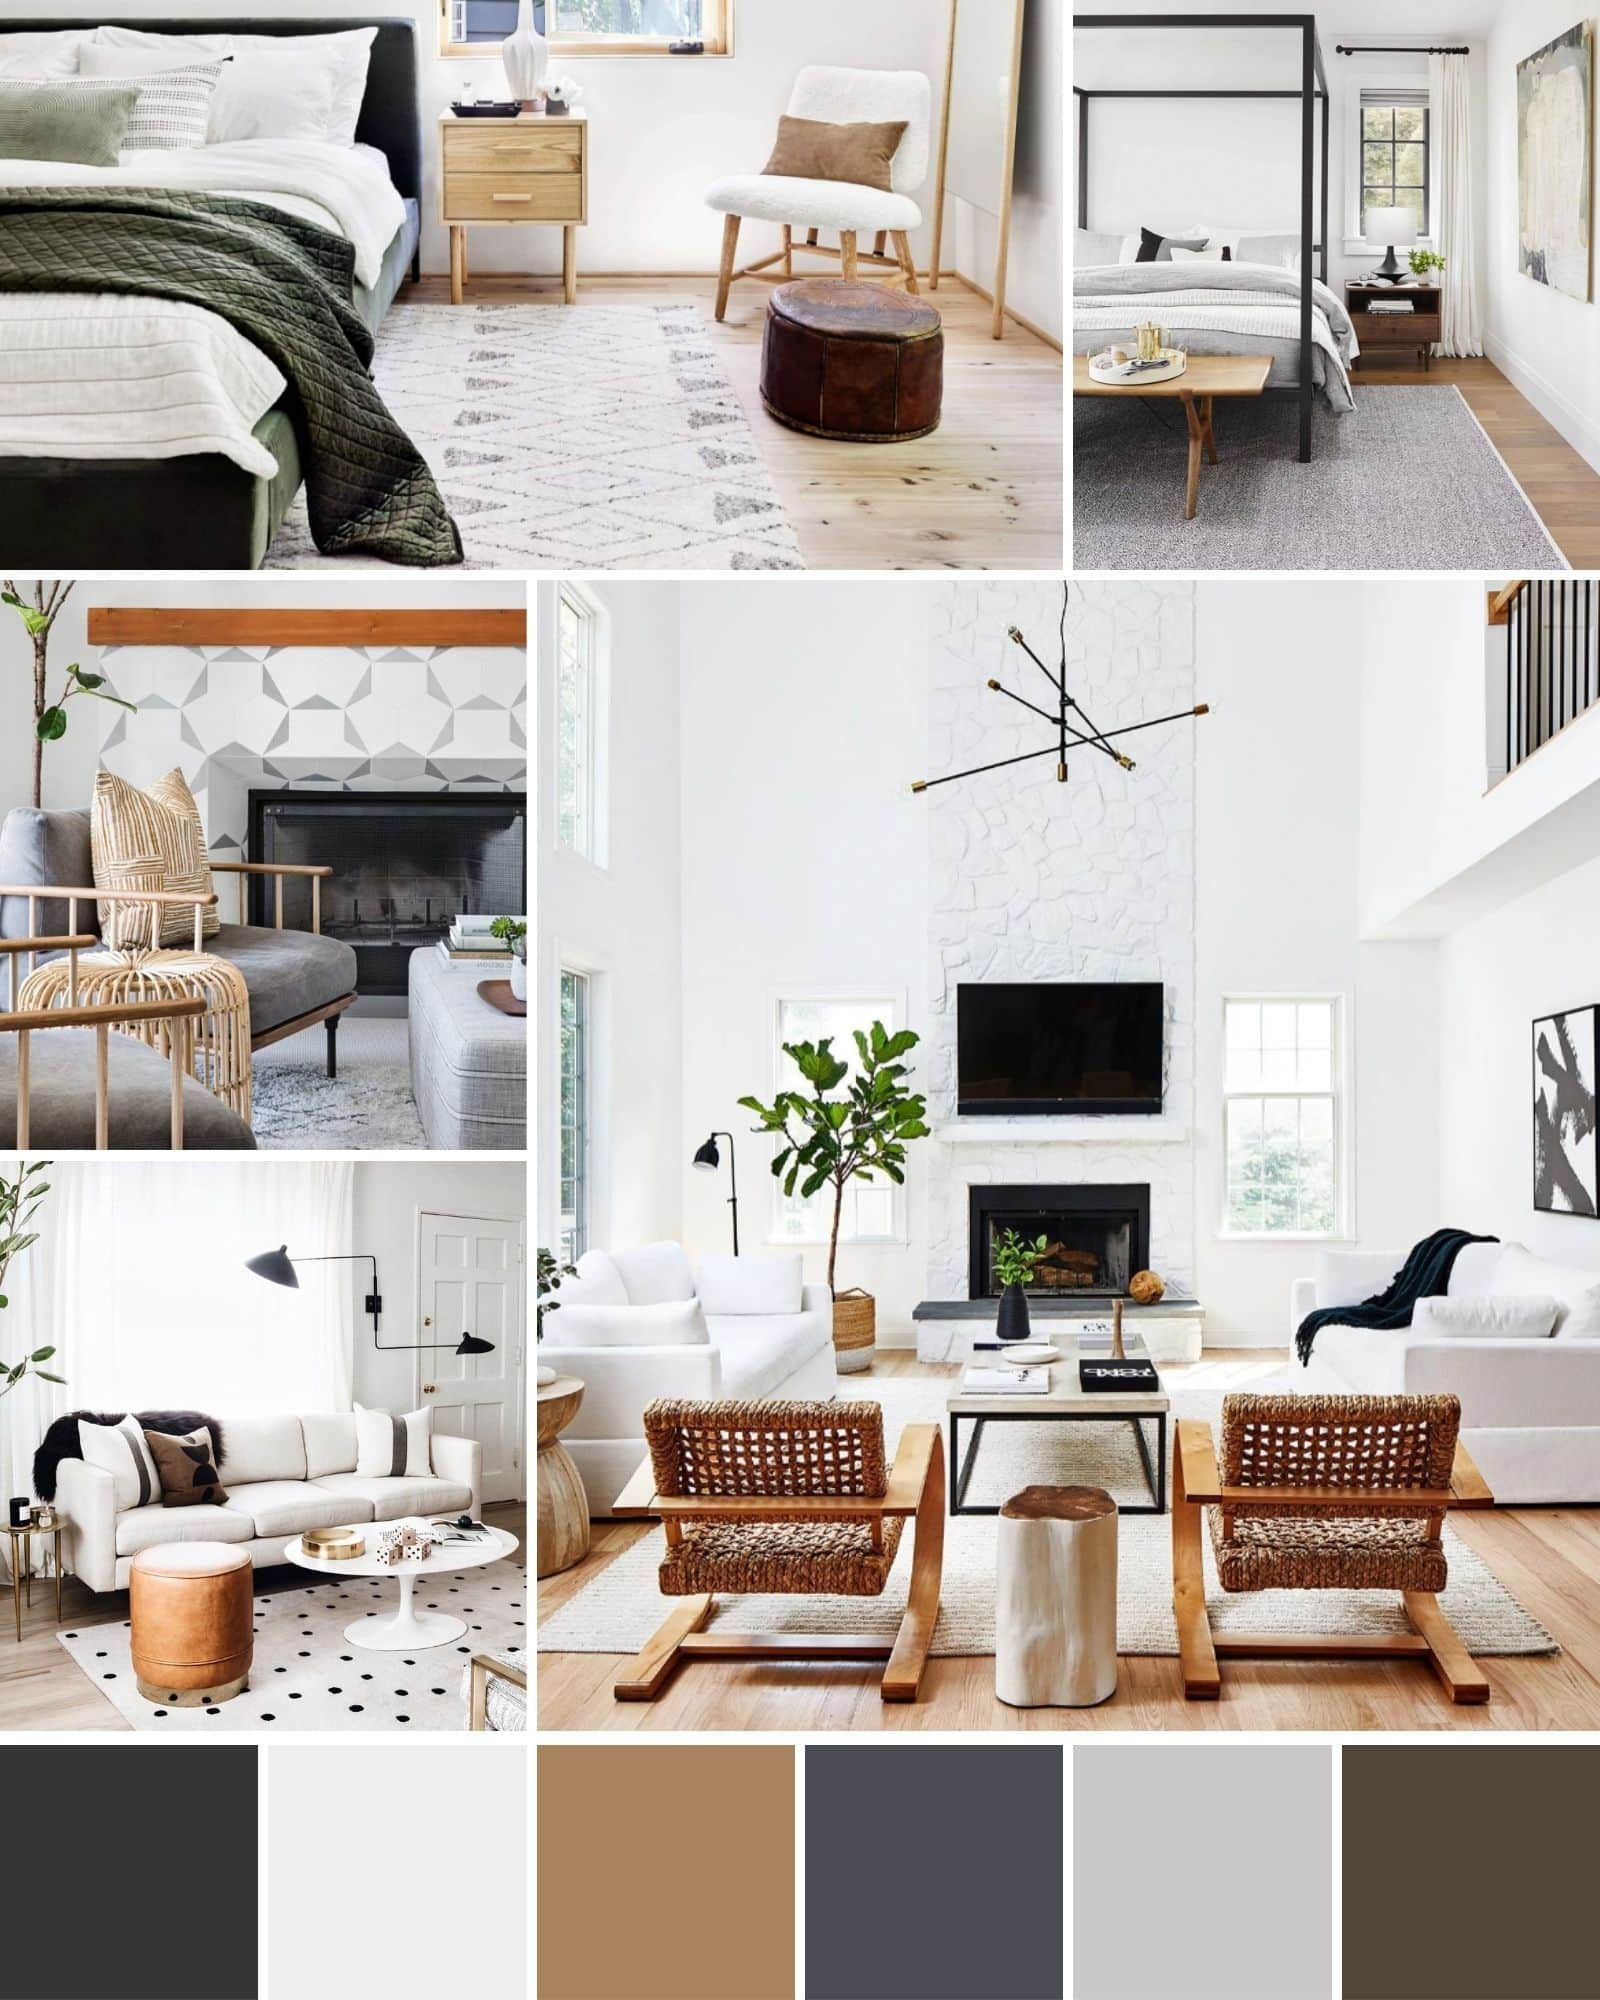 Interior Design Trends 2021 Top 4 Home Looks Tlc Interiors